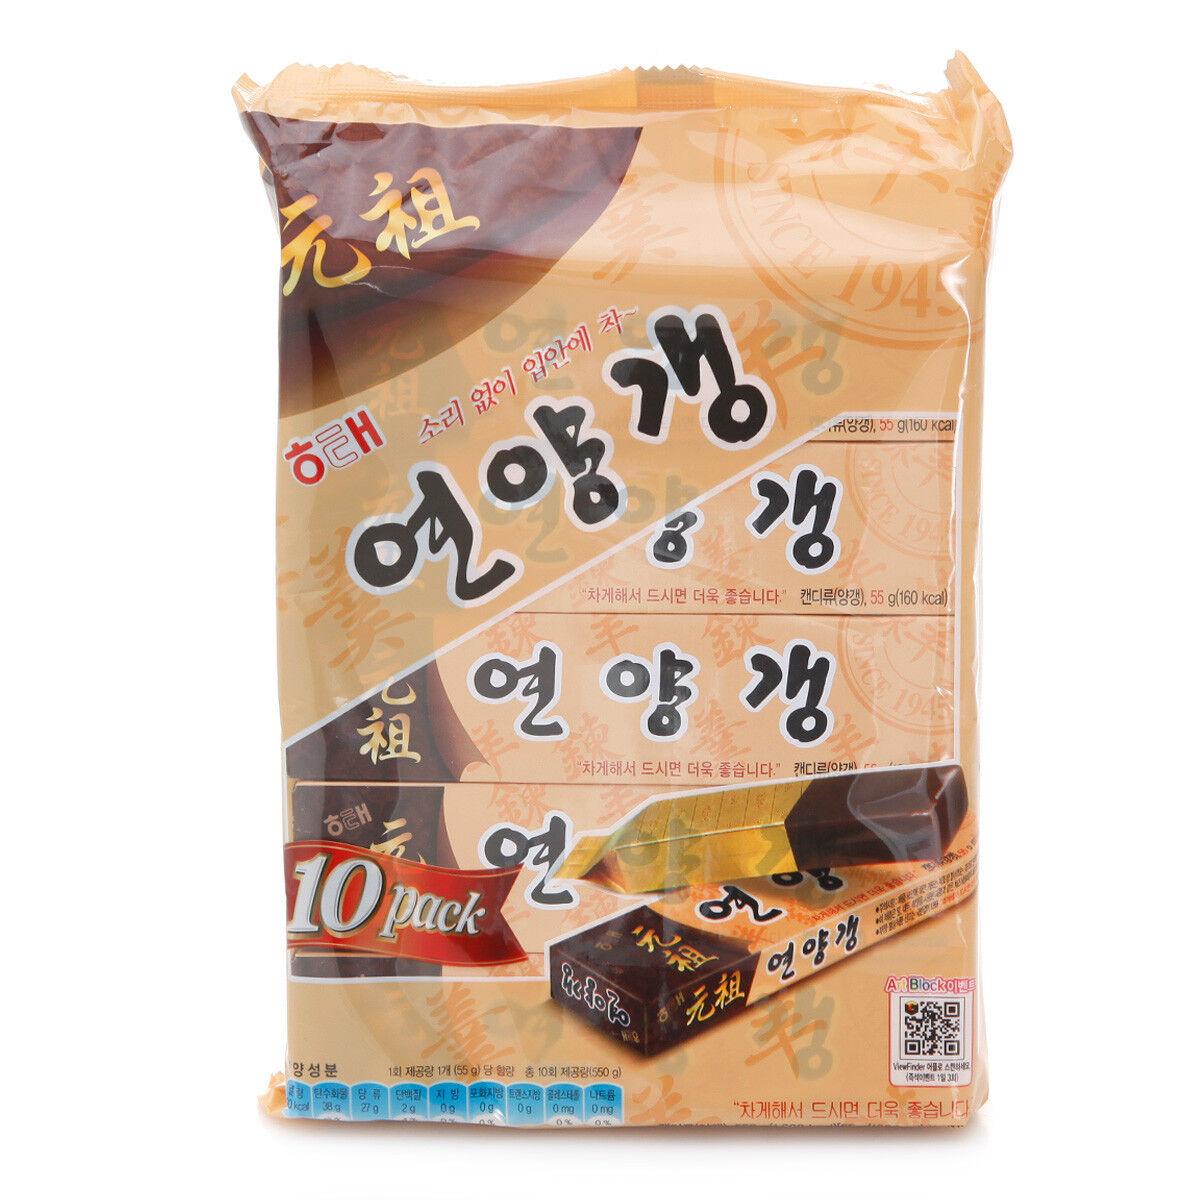 Yanggaeng Sweet Jelly of Red Beans Good Taste Korean Snack 5